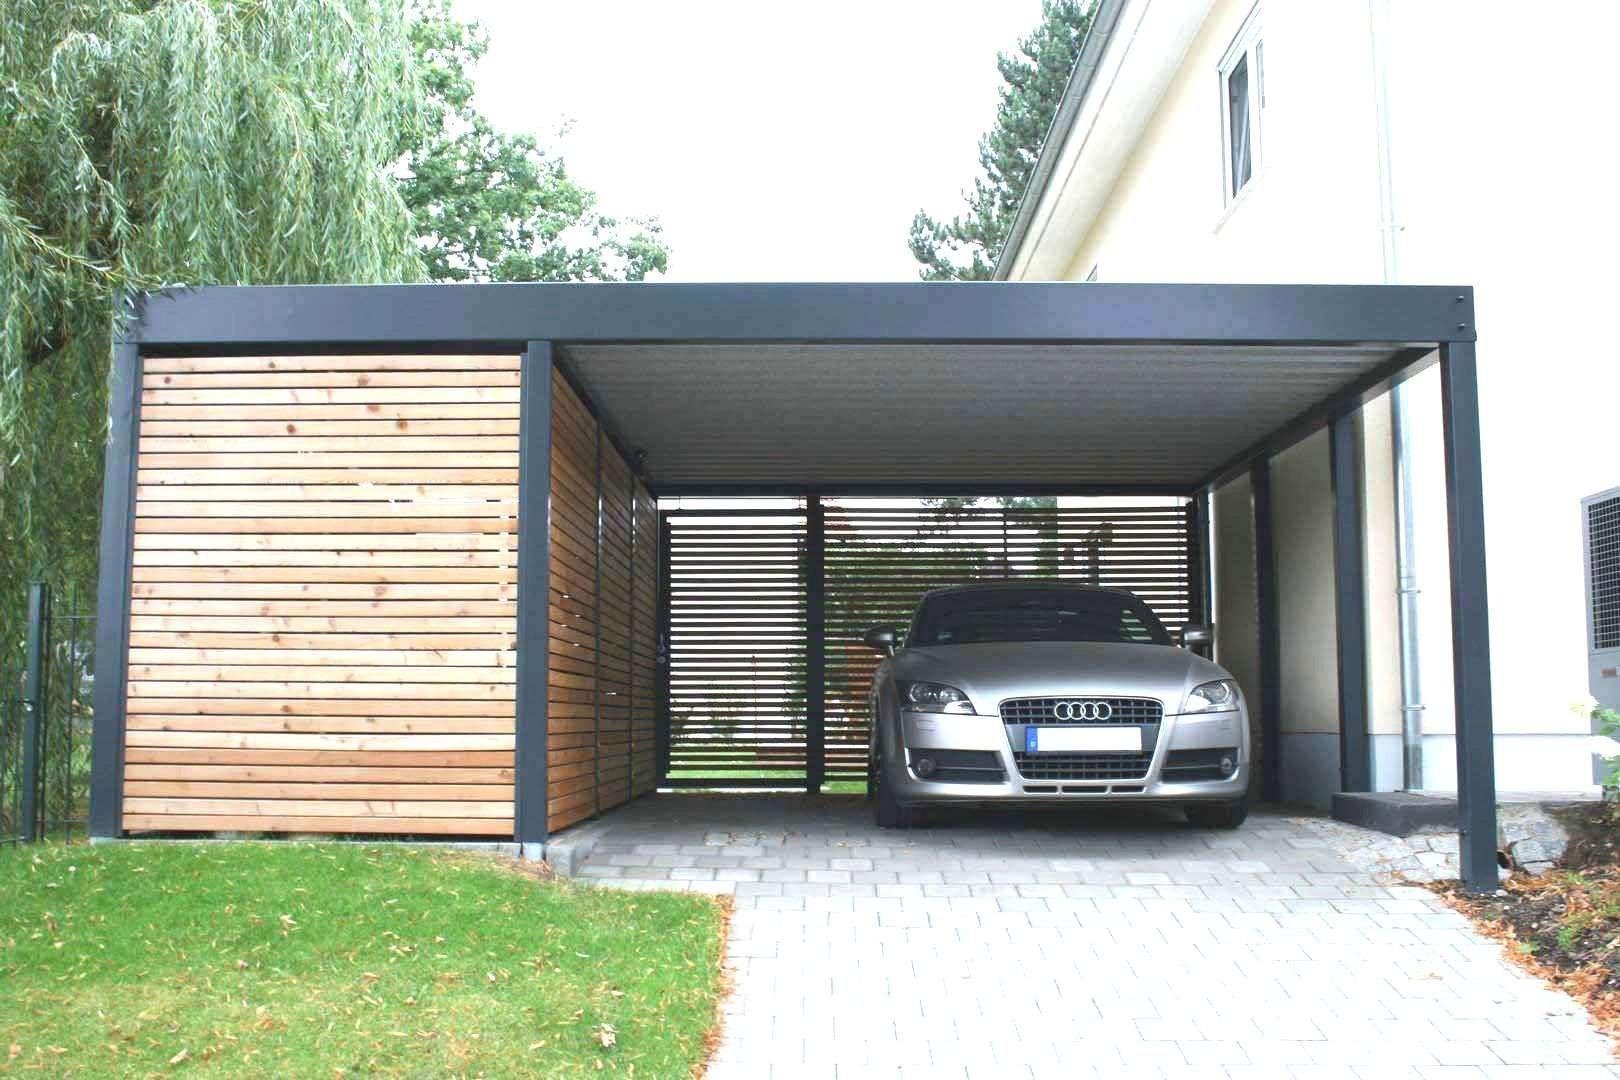 25 Awesome Wood Carports Carport Designs Modern Garage Modern Carport